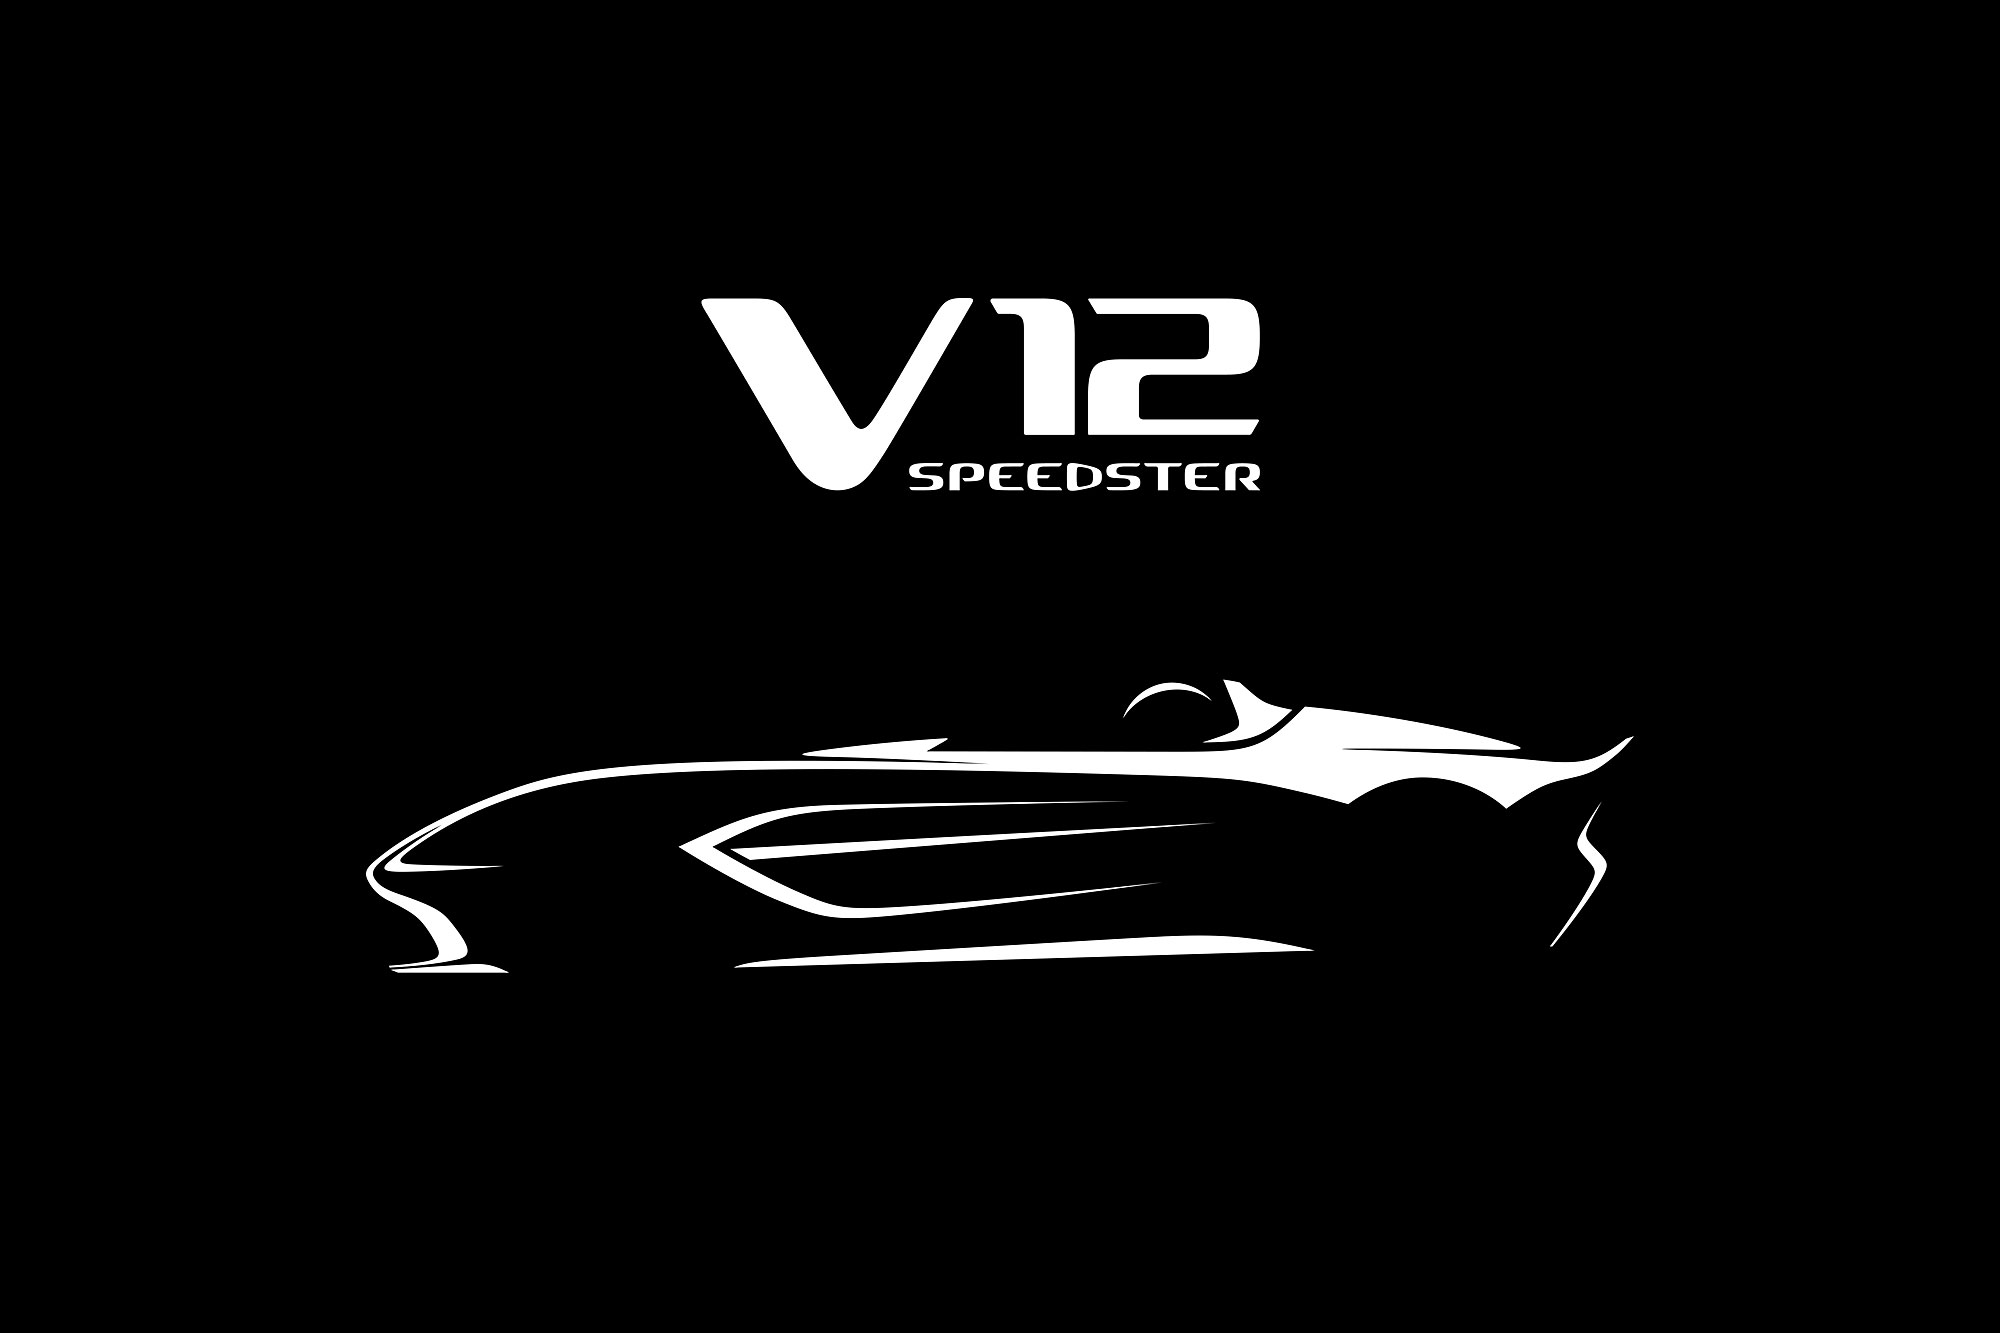 Aston Martin 預告推出限量 88 輛的 V12 Speedster 。